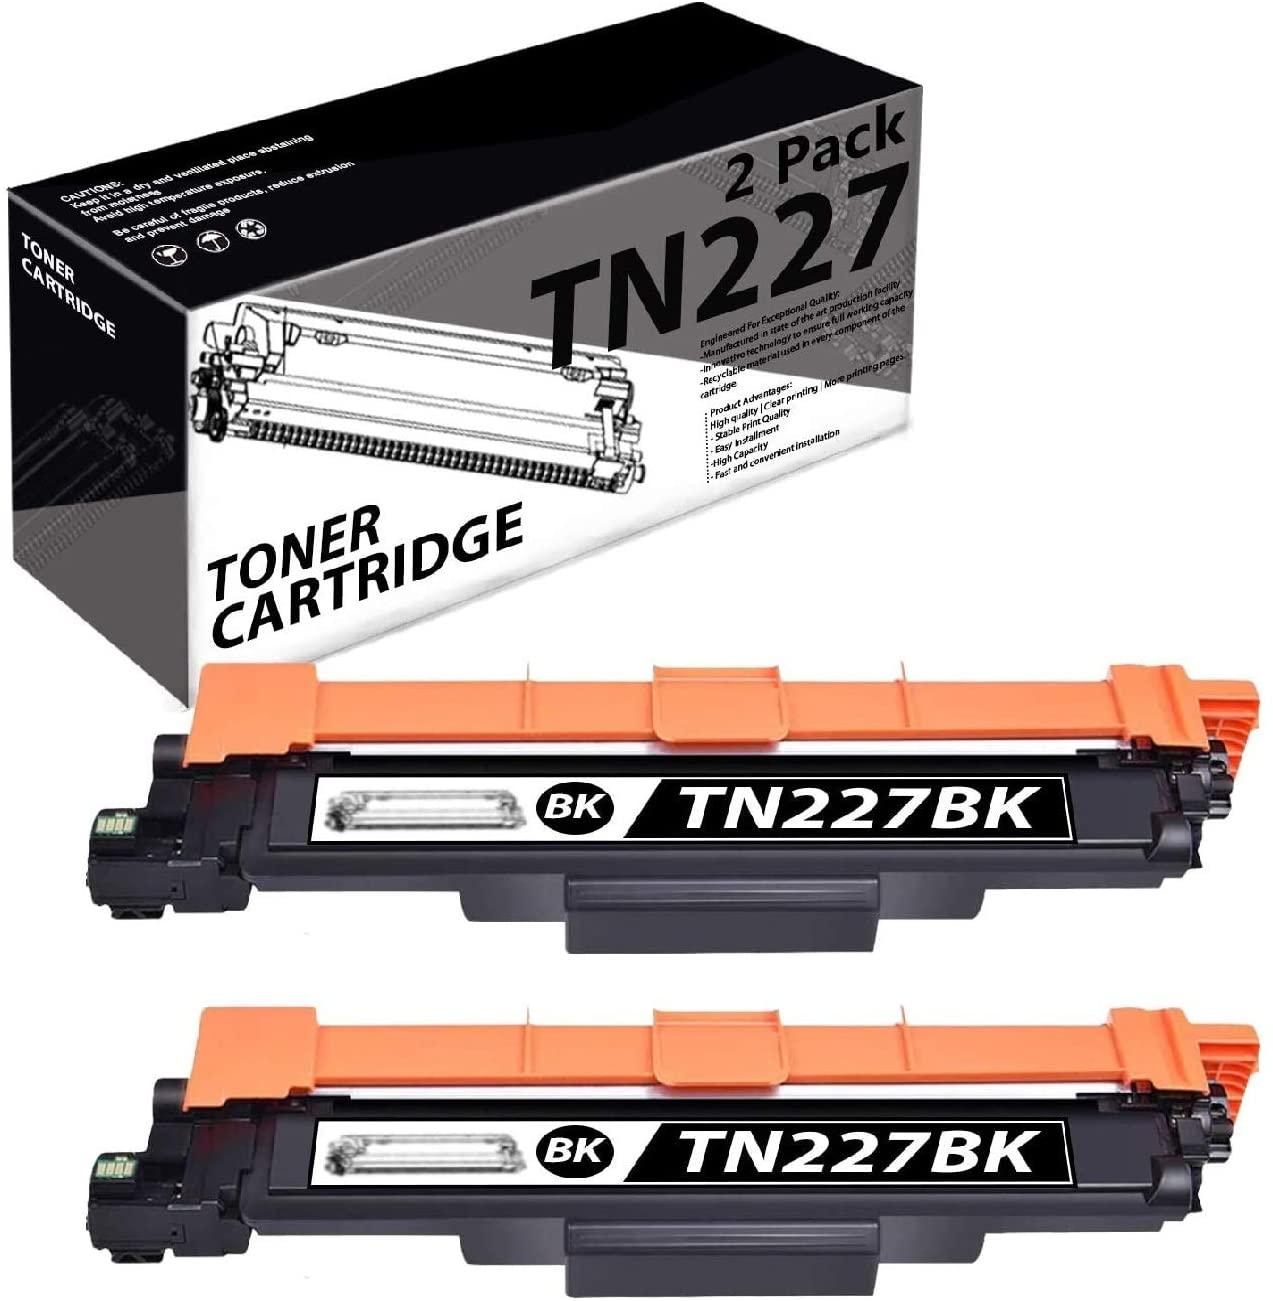 TN227(2 Pack-Black) Compatible Toner Cartridge Replacement for Brother HL-3210CW 3230CDW 3270CDW DCP-L3510CDW L3550CDW MFC-L3770CDW L3710CW L3750CDW Printers.